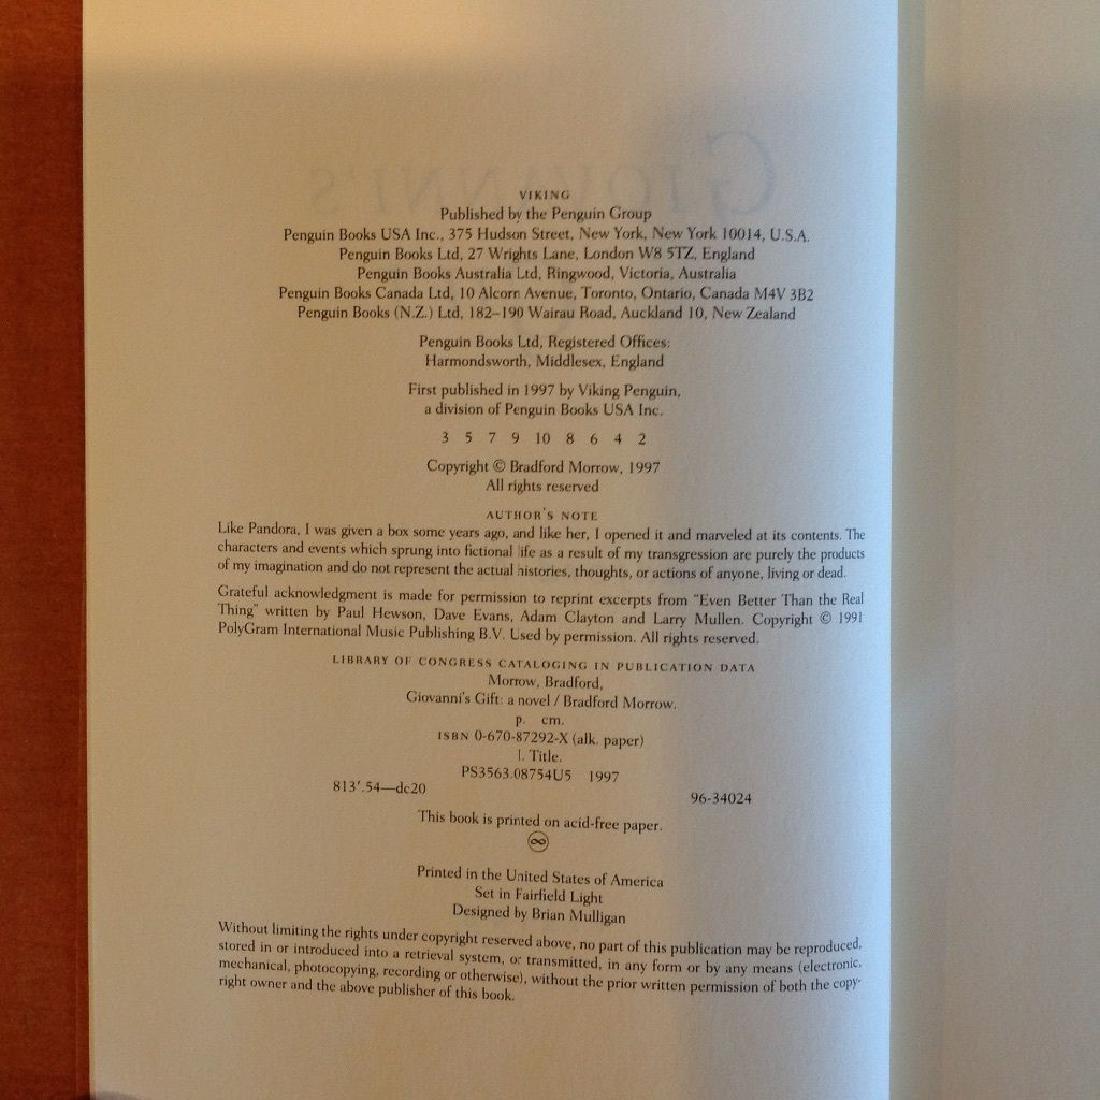 Bradford Morrow: Giovanni's Gift, 1997 - Signed - 5